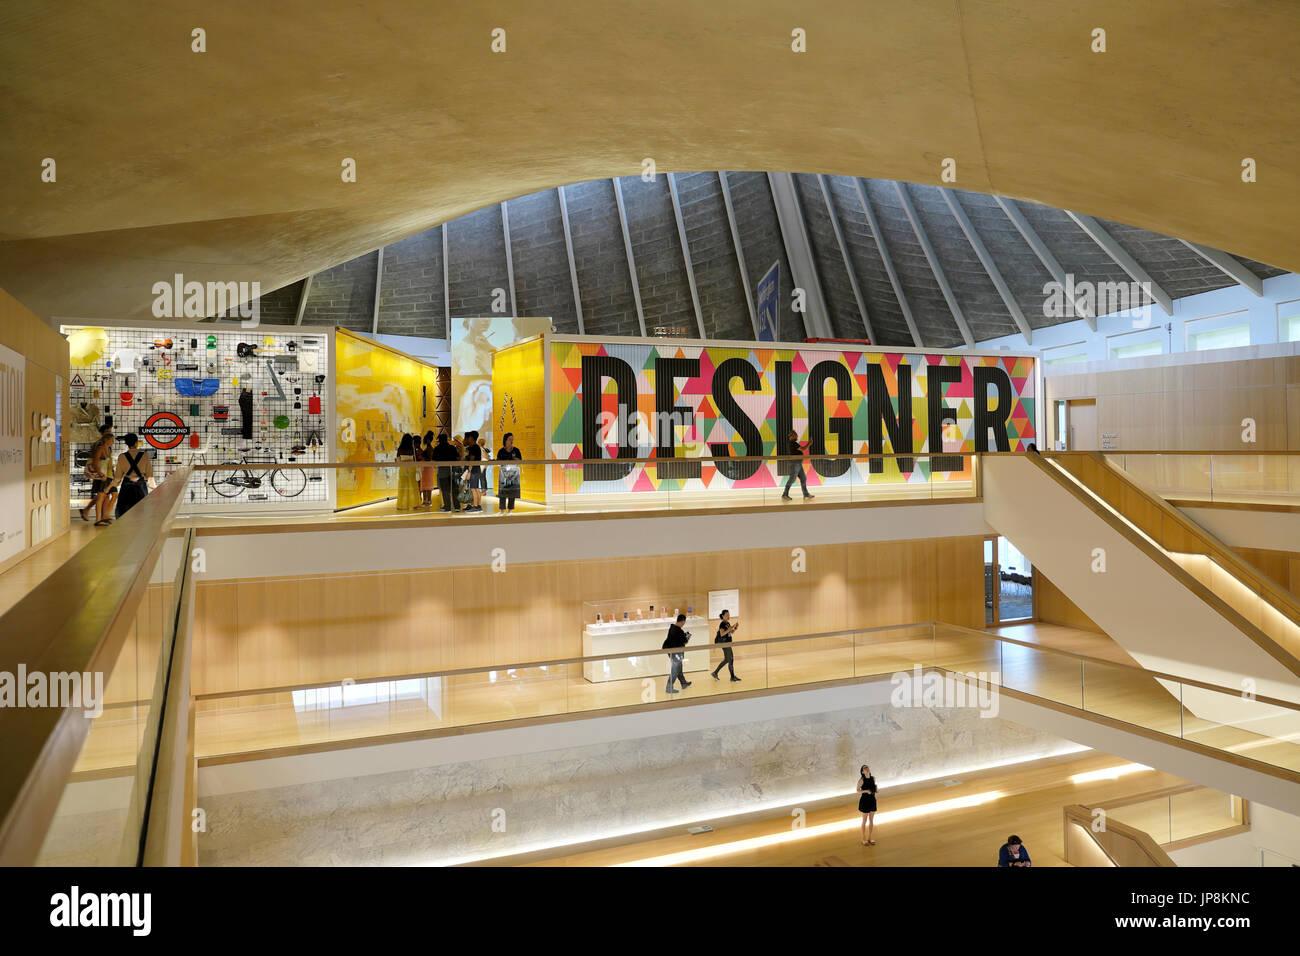 Interior Gallery London Architecture Stock Photos ...